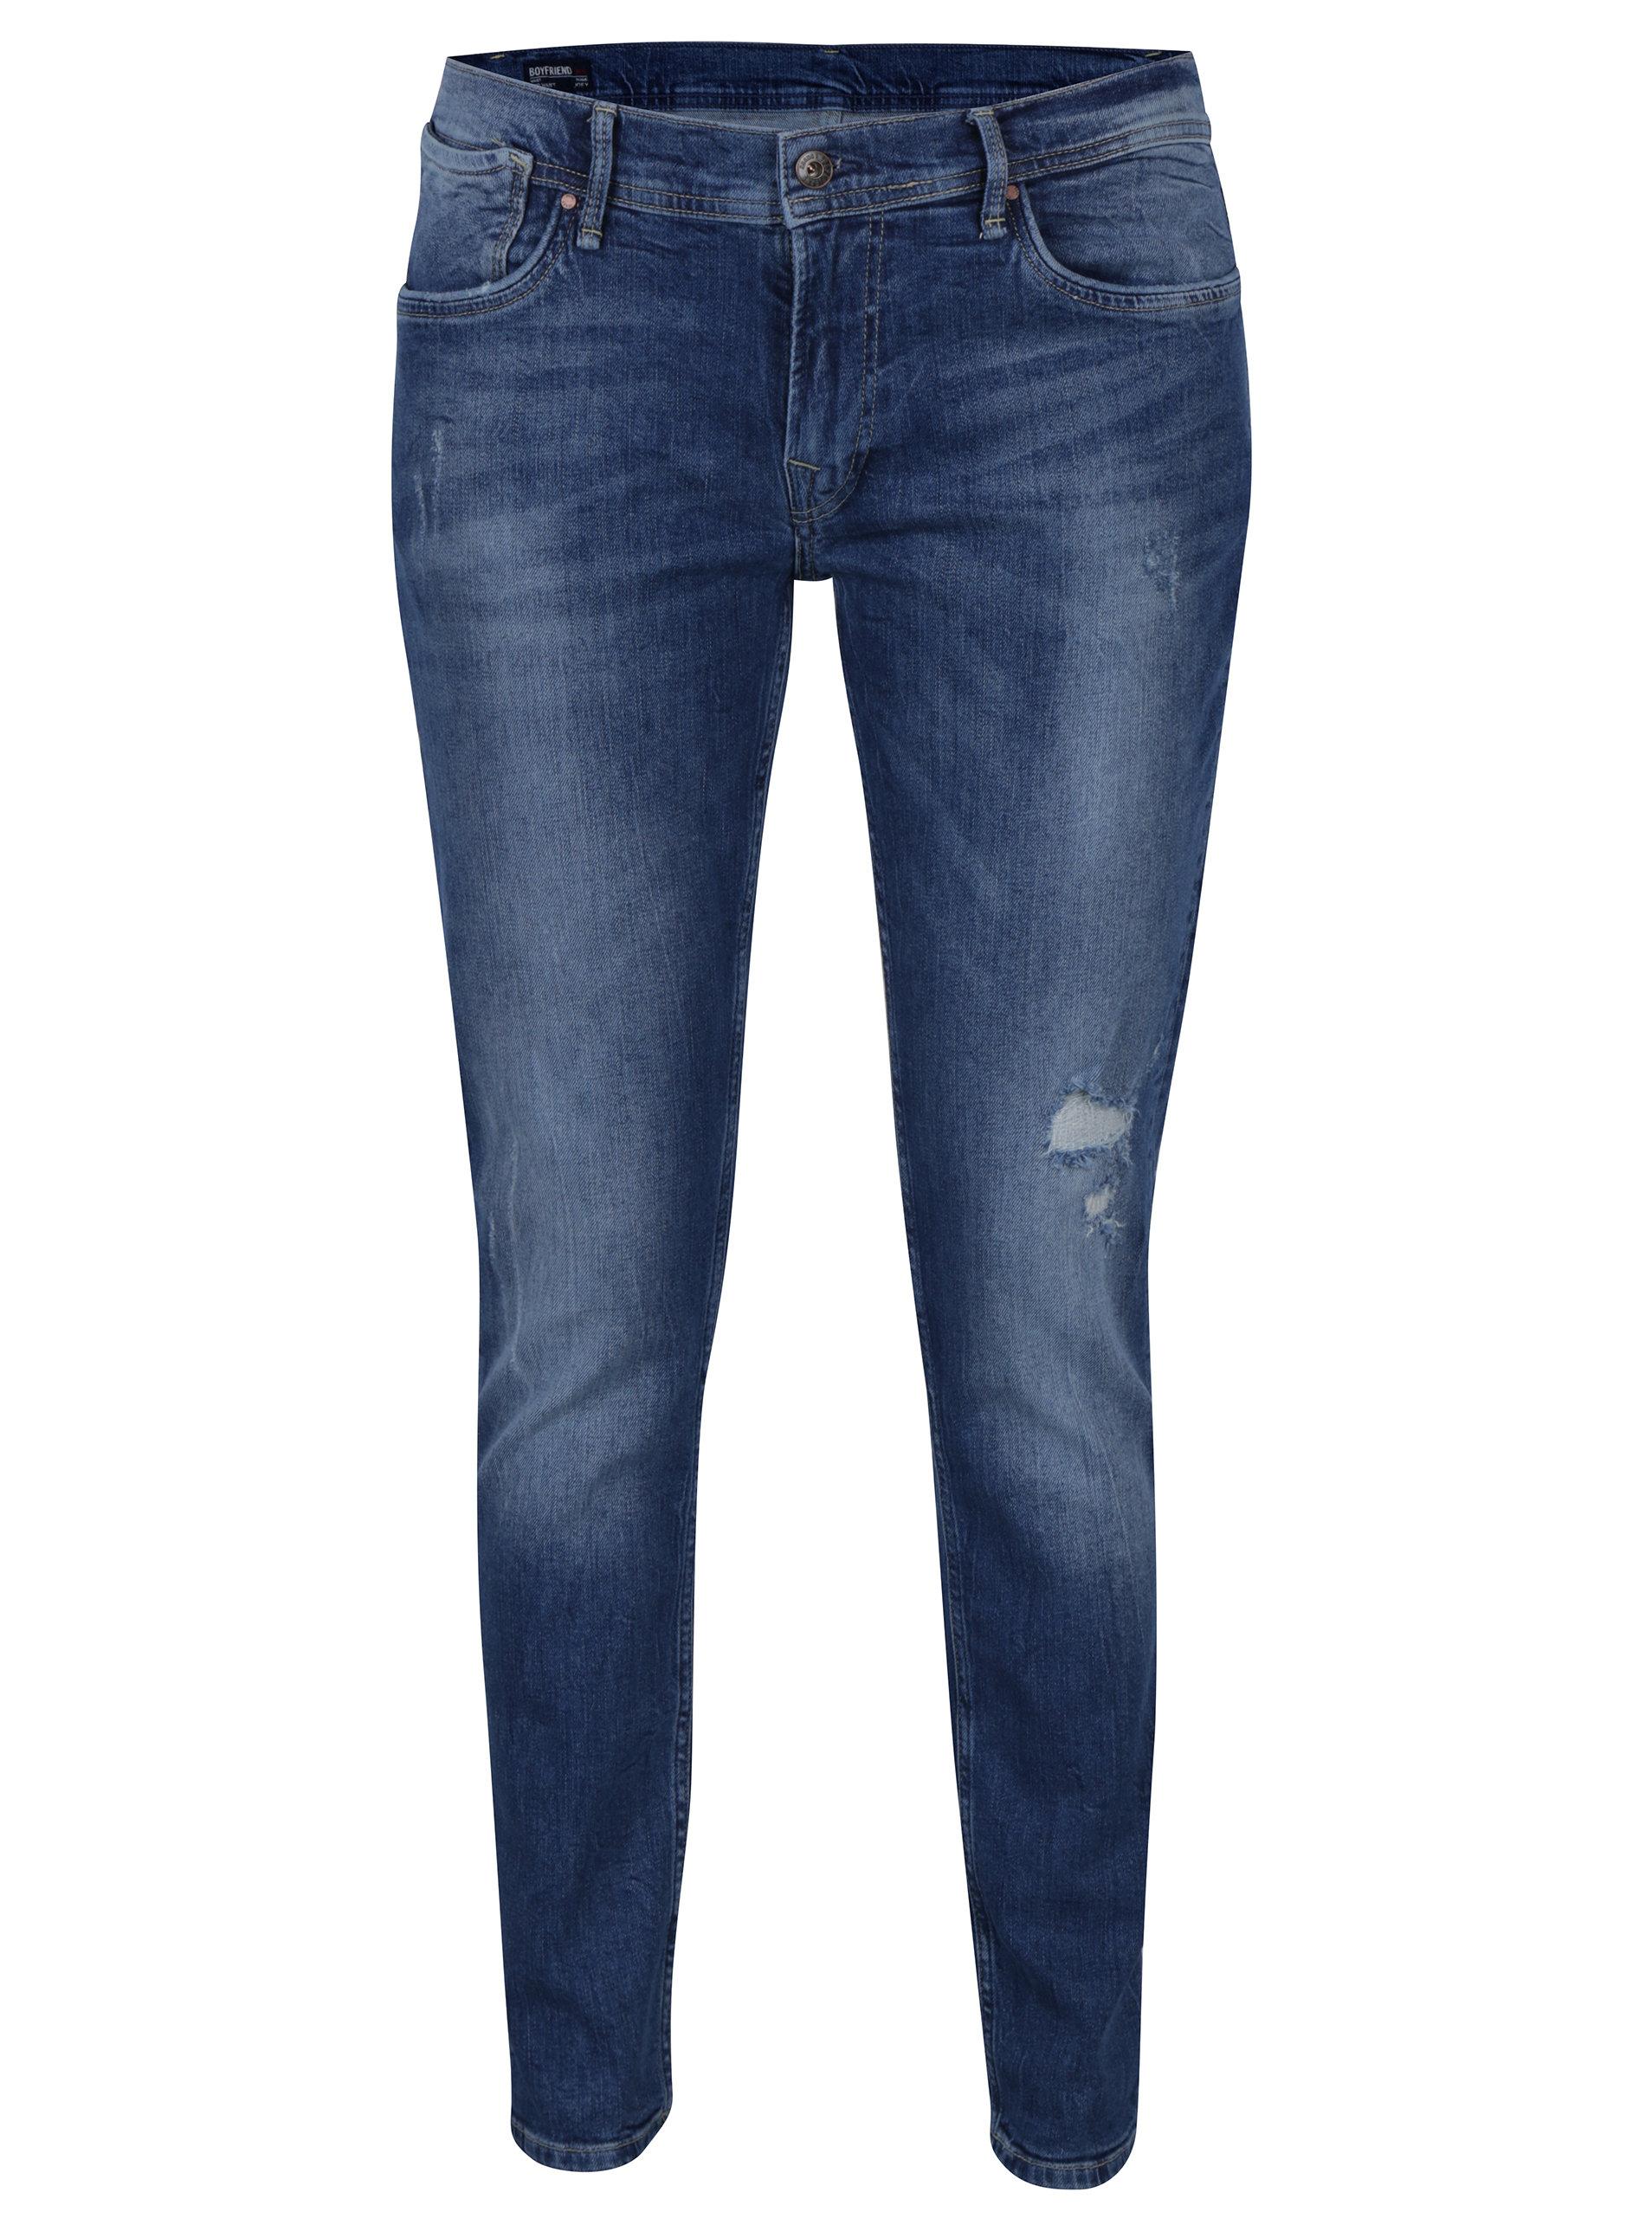 Modré dámské boyfriend džíny Pepe Jeans Joey ... 44ae2eaa0f